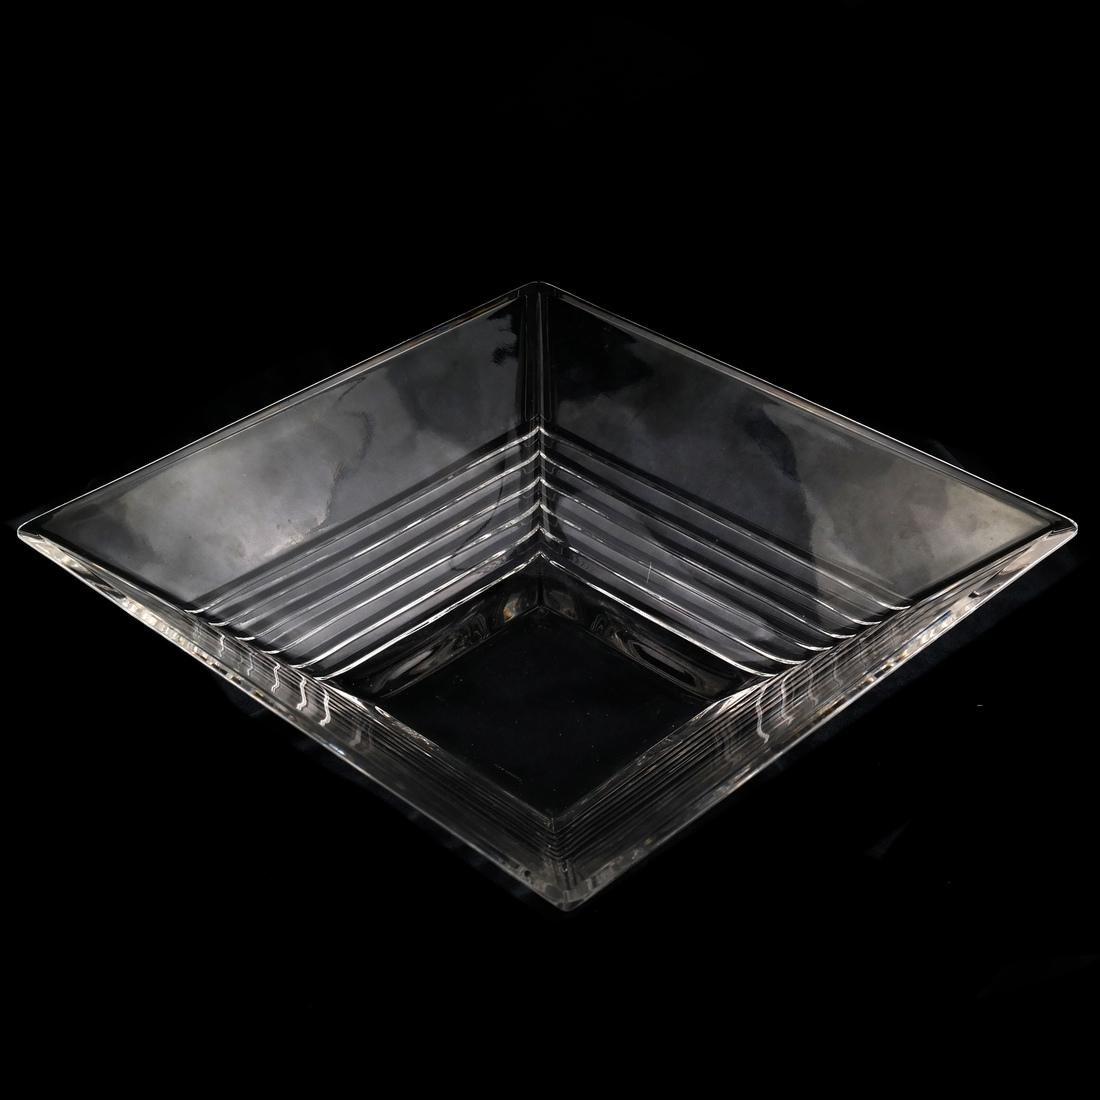 Tiffany & Co. Crystal Square Bowl